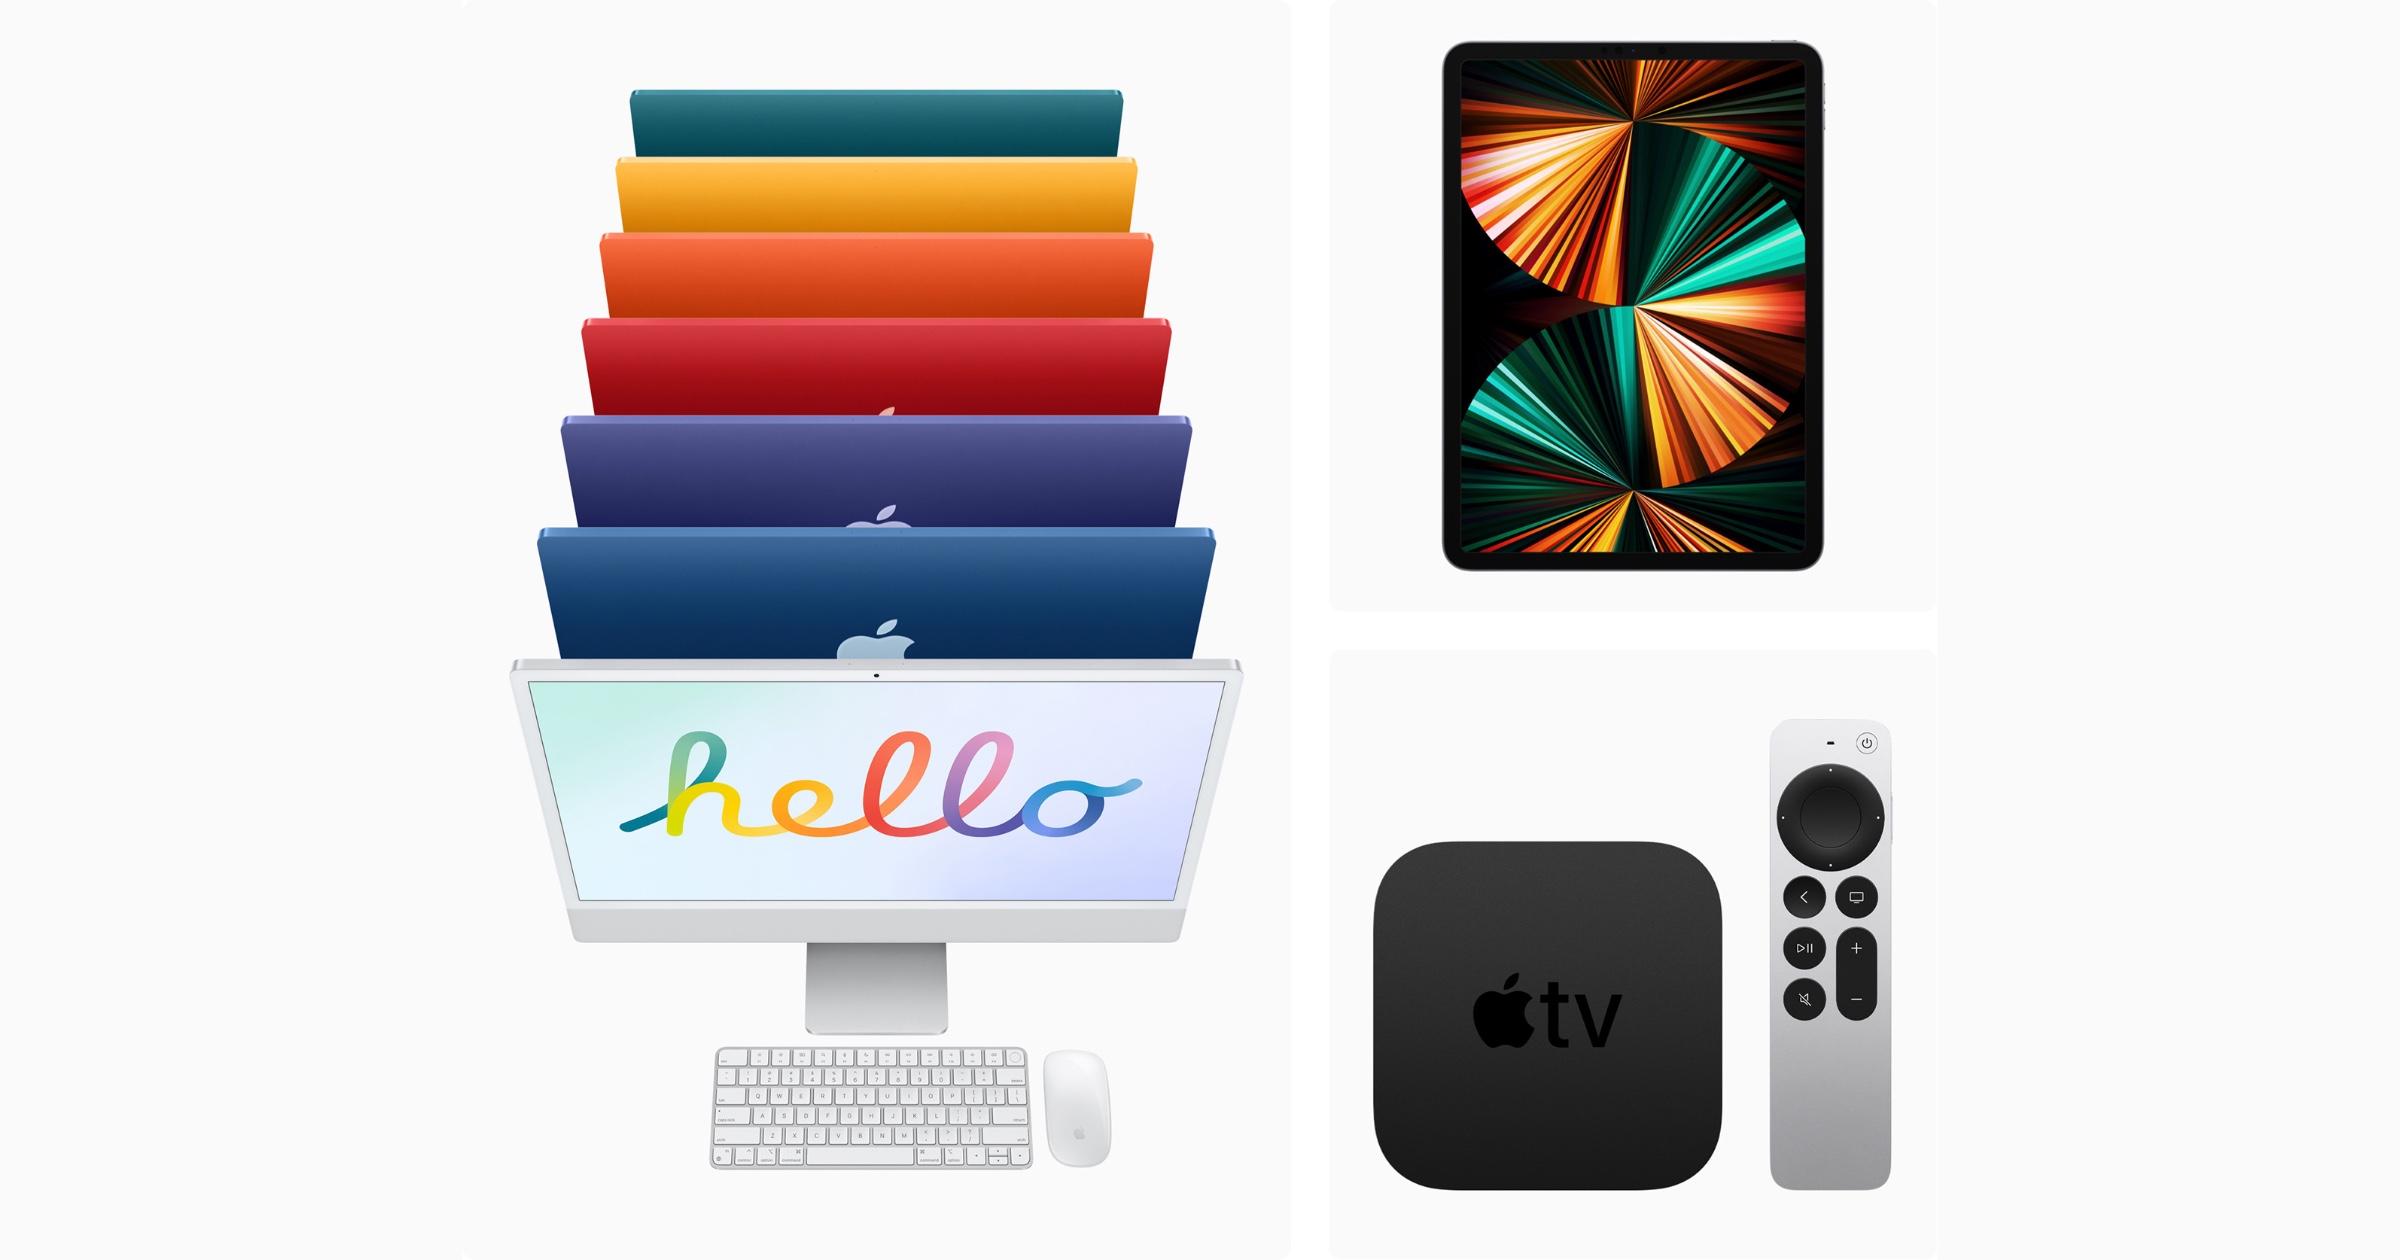 M1 iMac iPad Pro Apple TV 4K